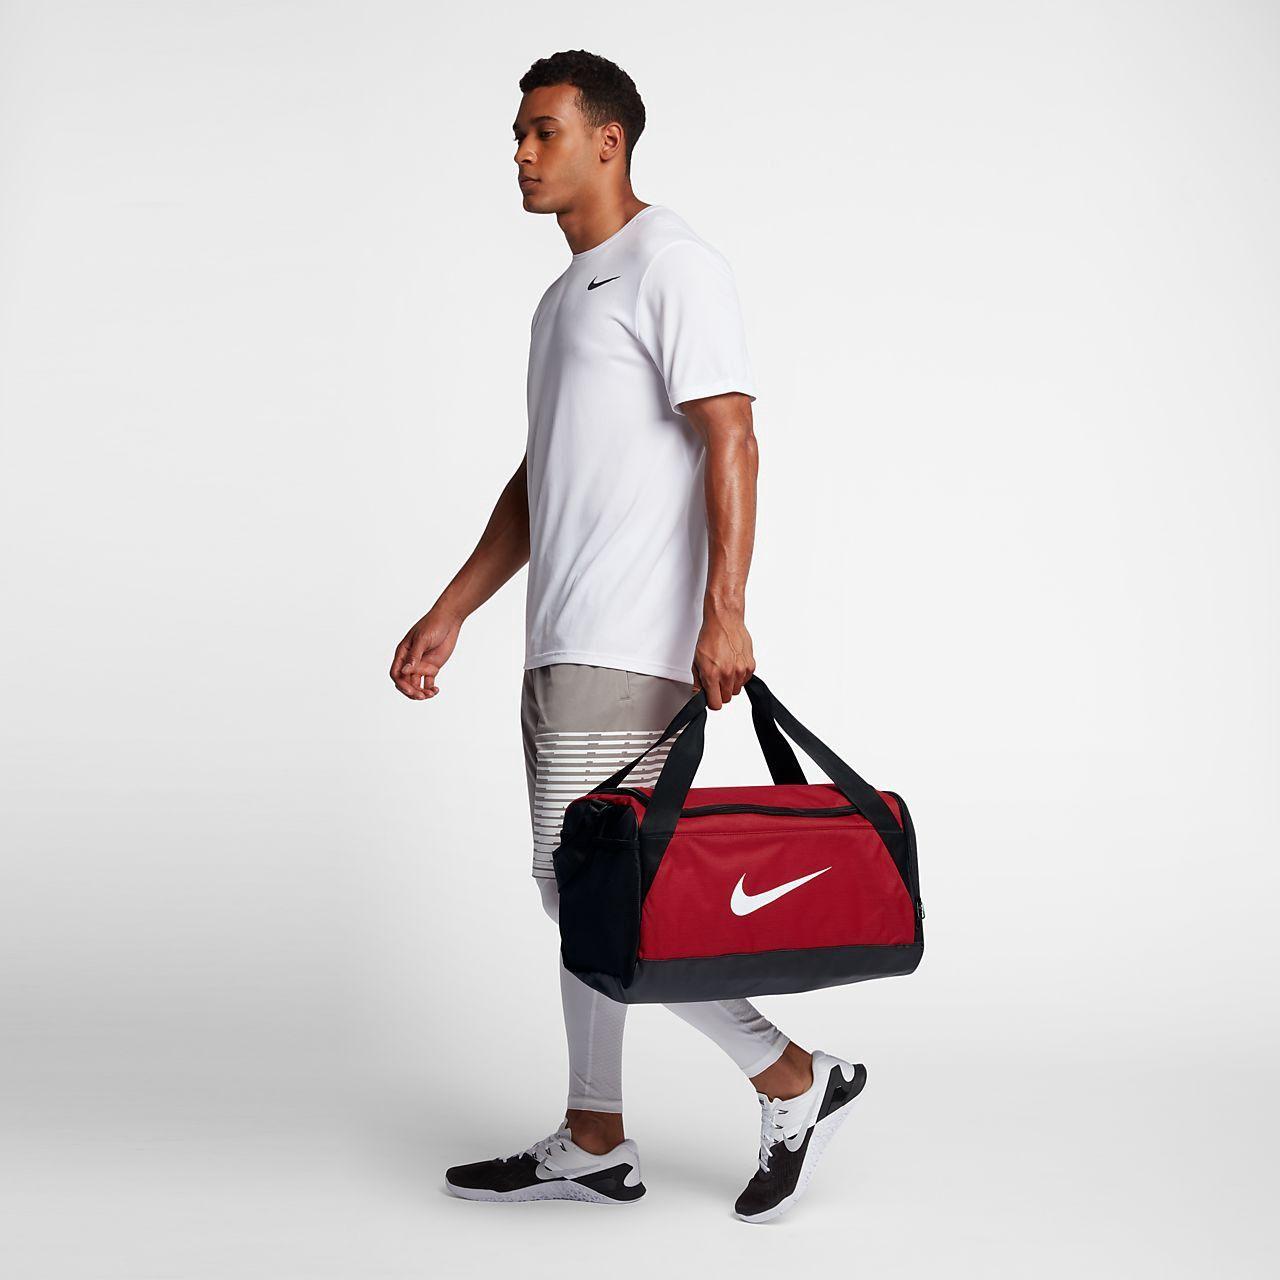 0aa5595fb38e Nike Brasilia (Small) Training Duffel Bag - One Size University  Red Black White